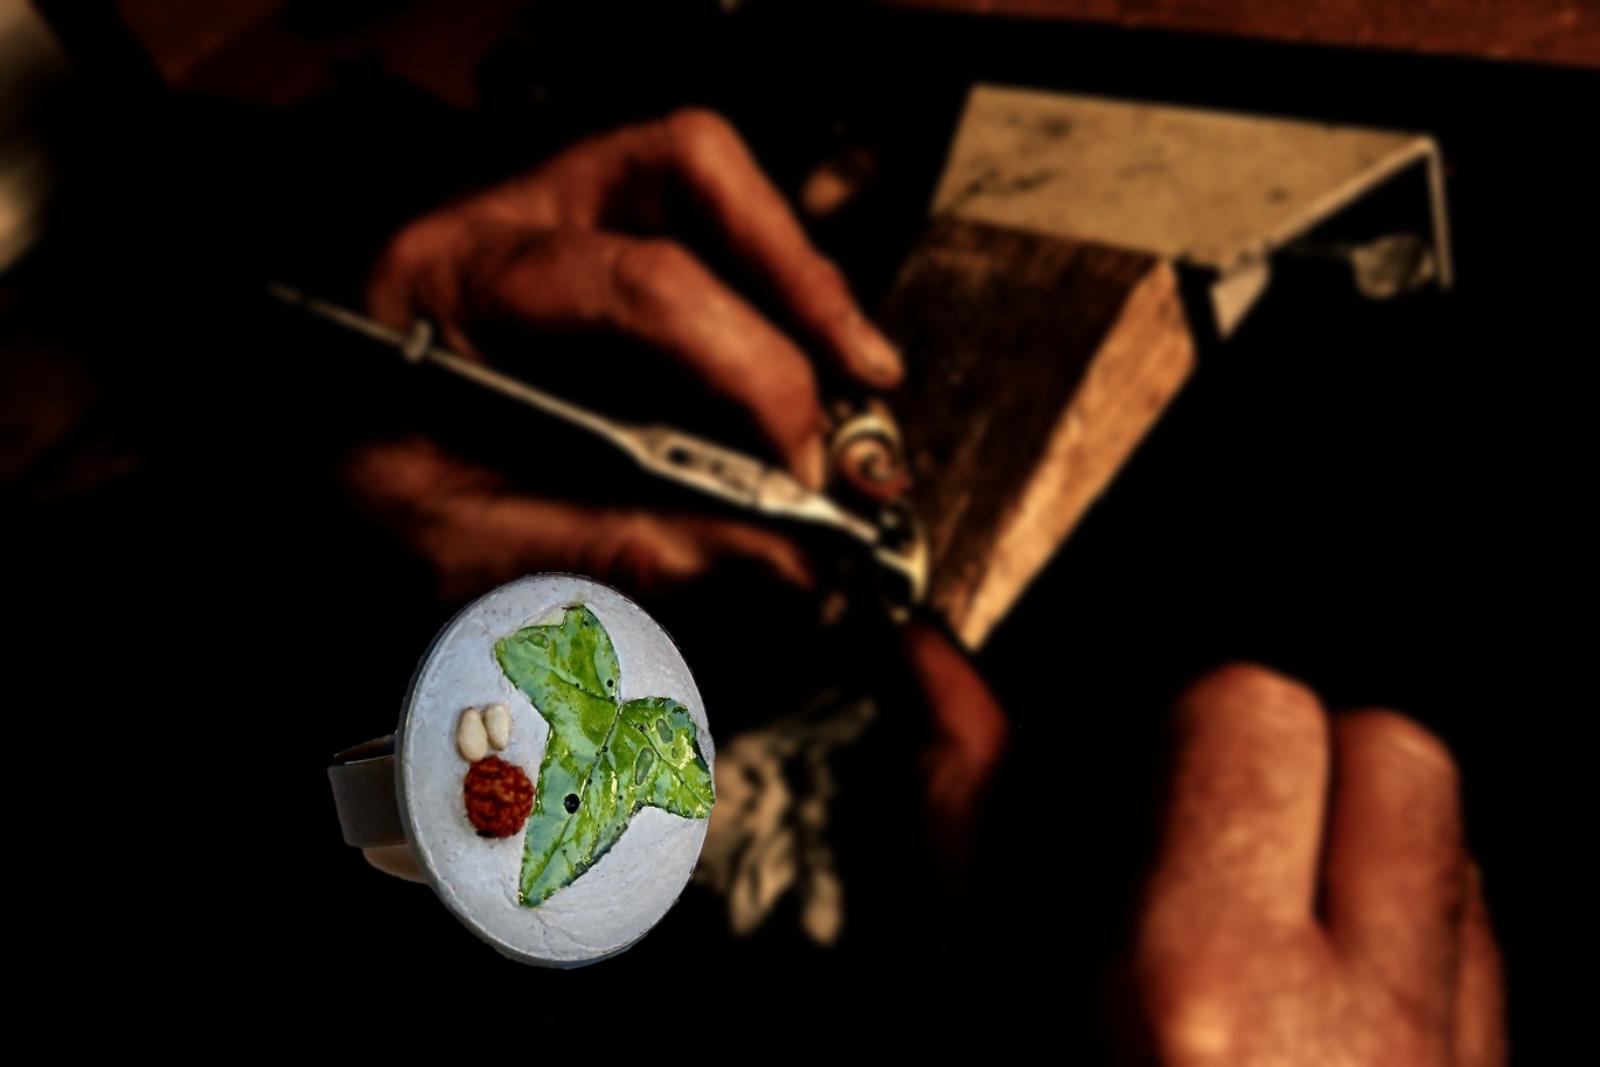 fabrication-bijoux-artisanaux-bague-feui